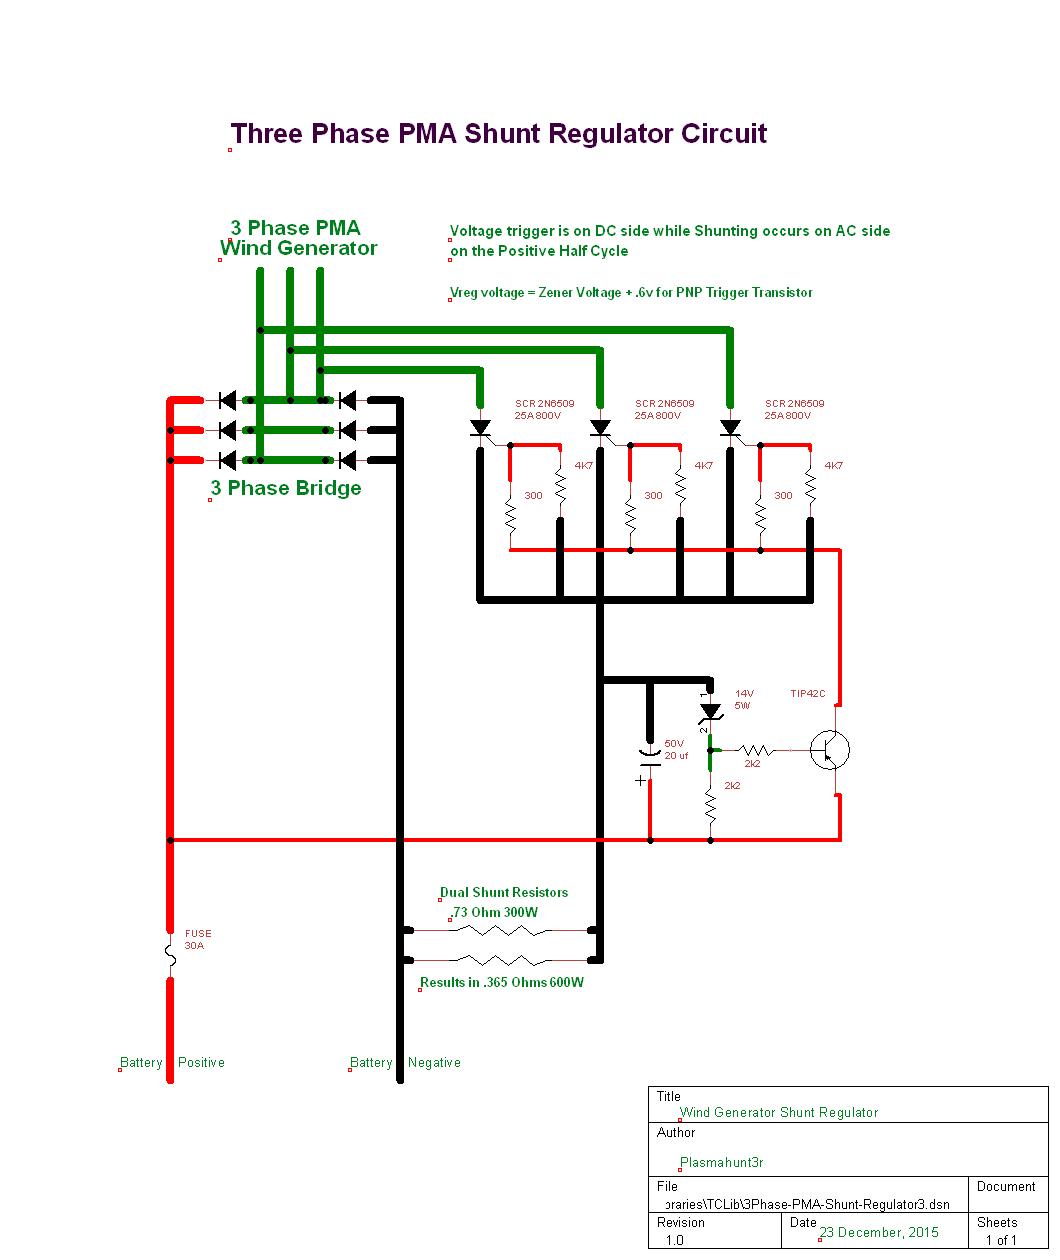 hight resolution of 3phase pma shunt regulator3 png